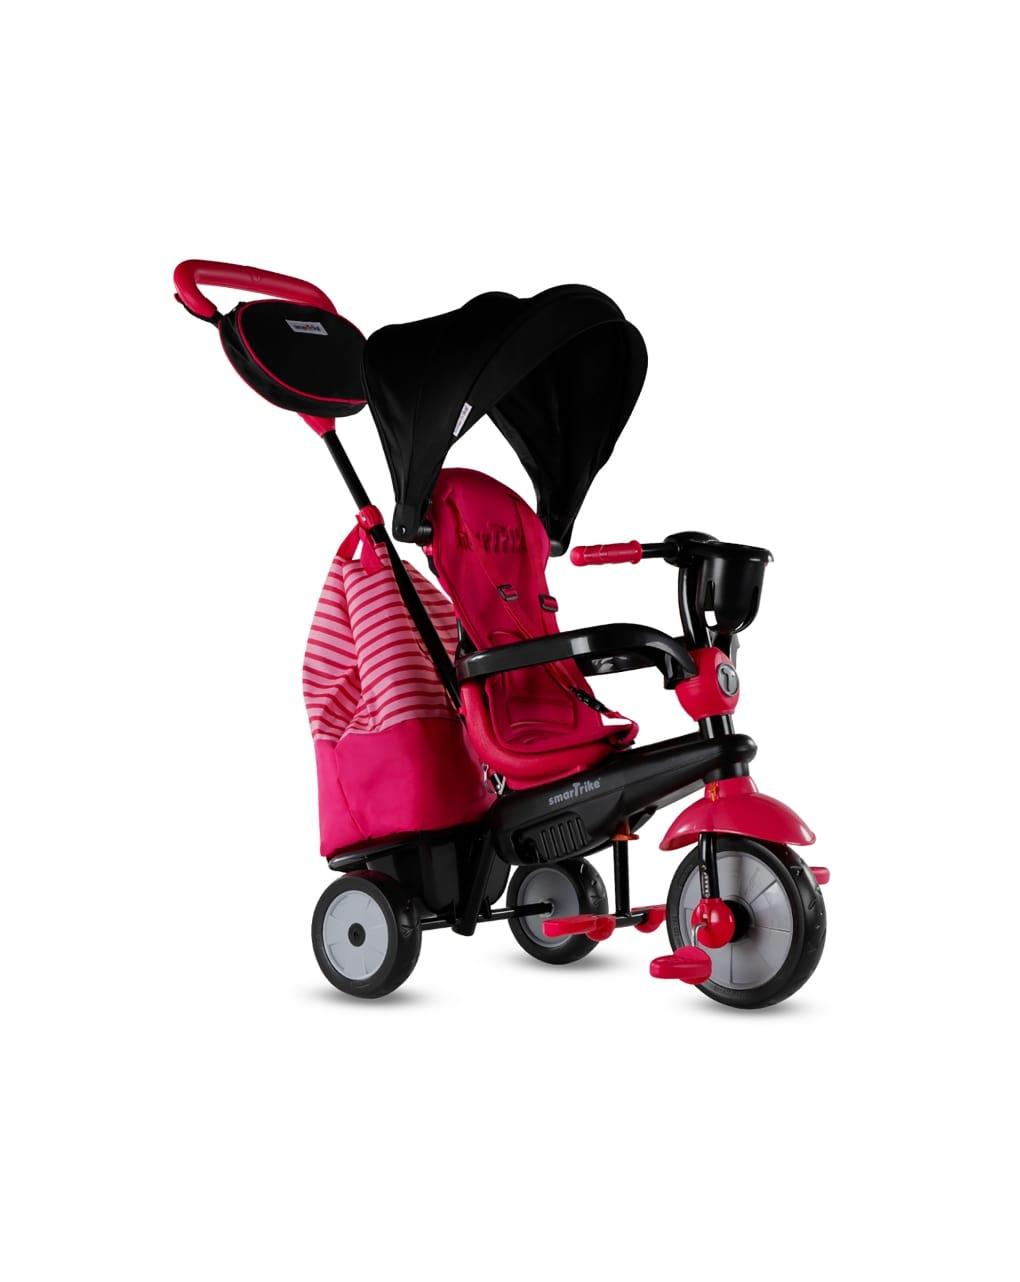 Smartrike Swing DLX Ποδήλατο Τρίκυκλο - Κόκκινο